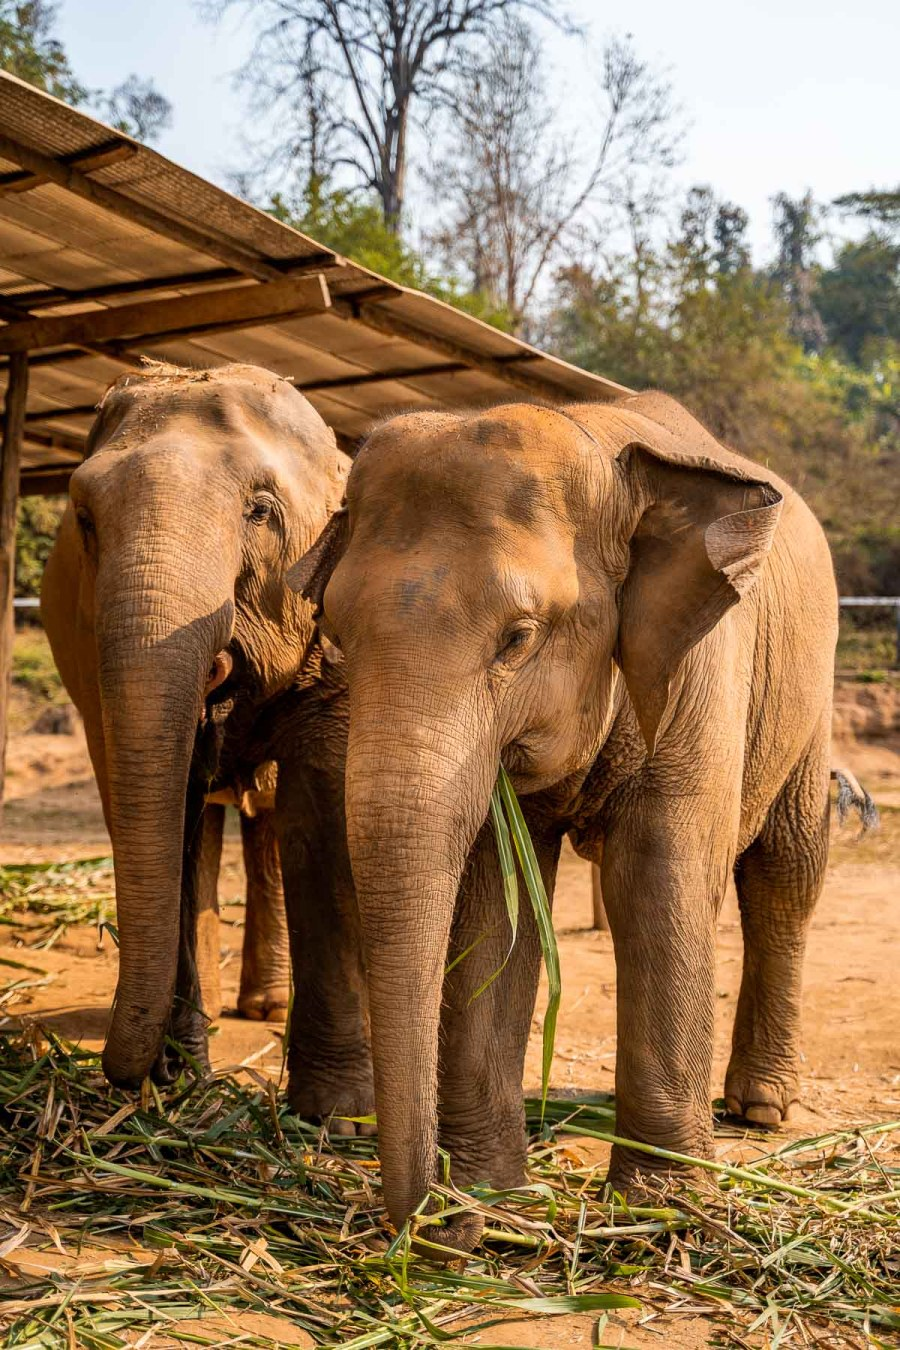 Two elephants feeding on grass at Elephant Jungle Sanctuary Chiang Mai